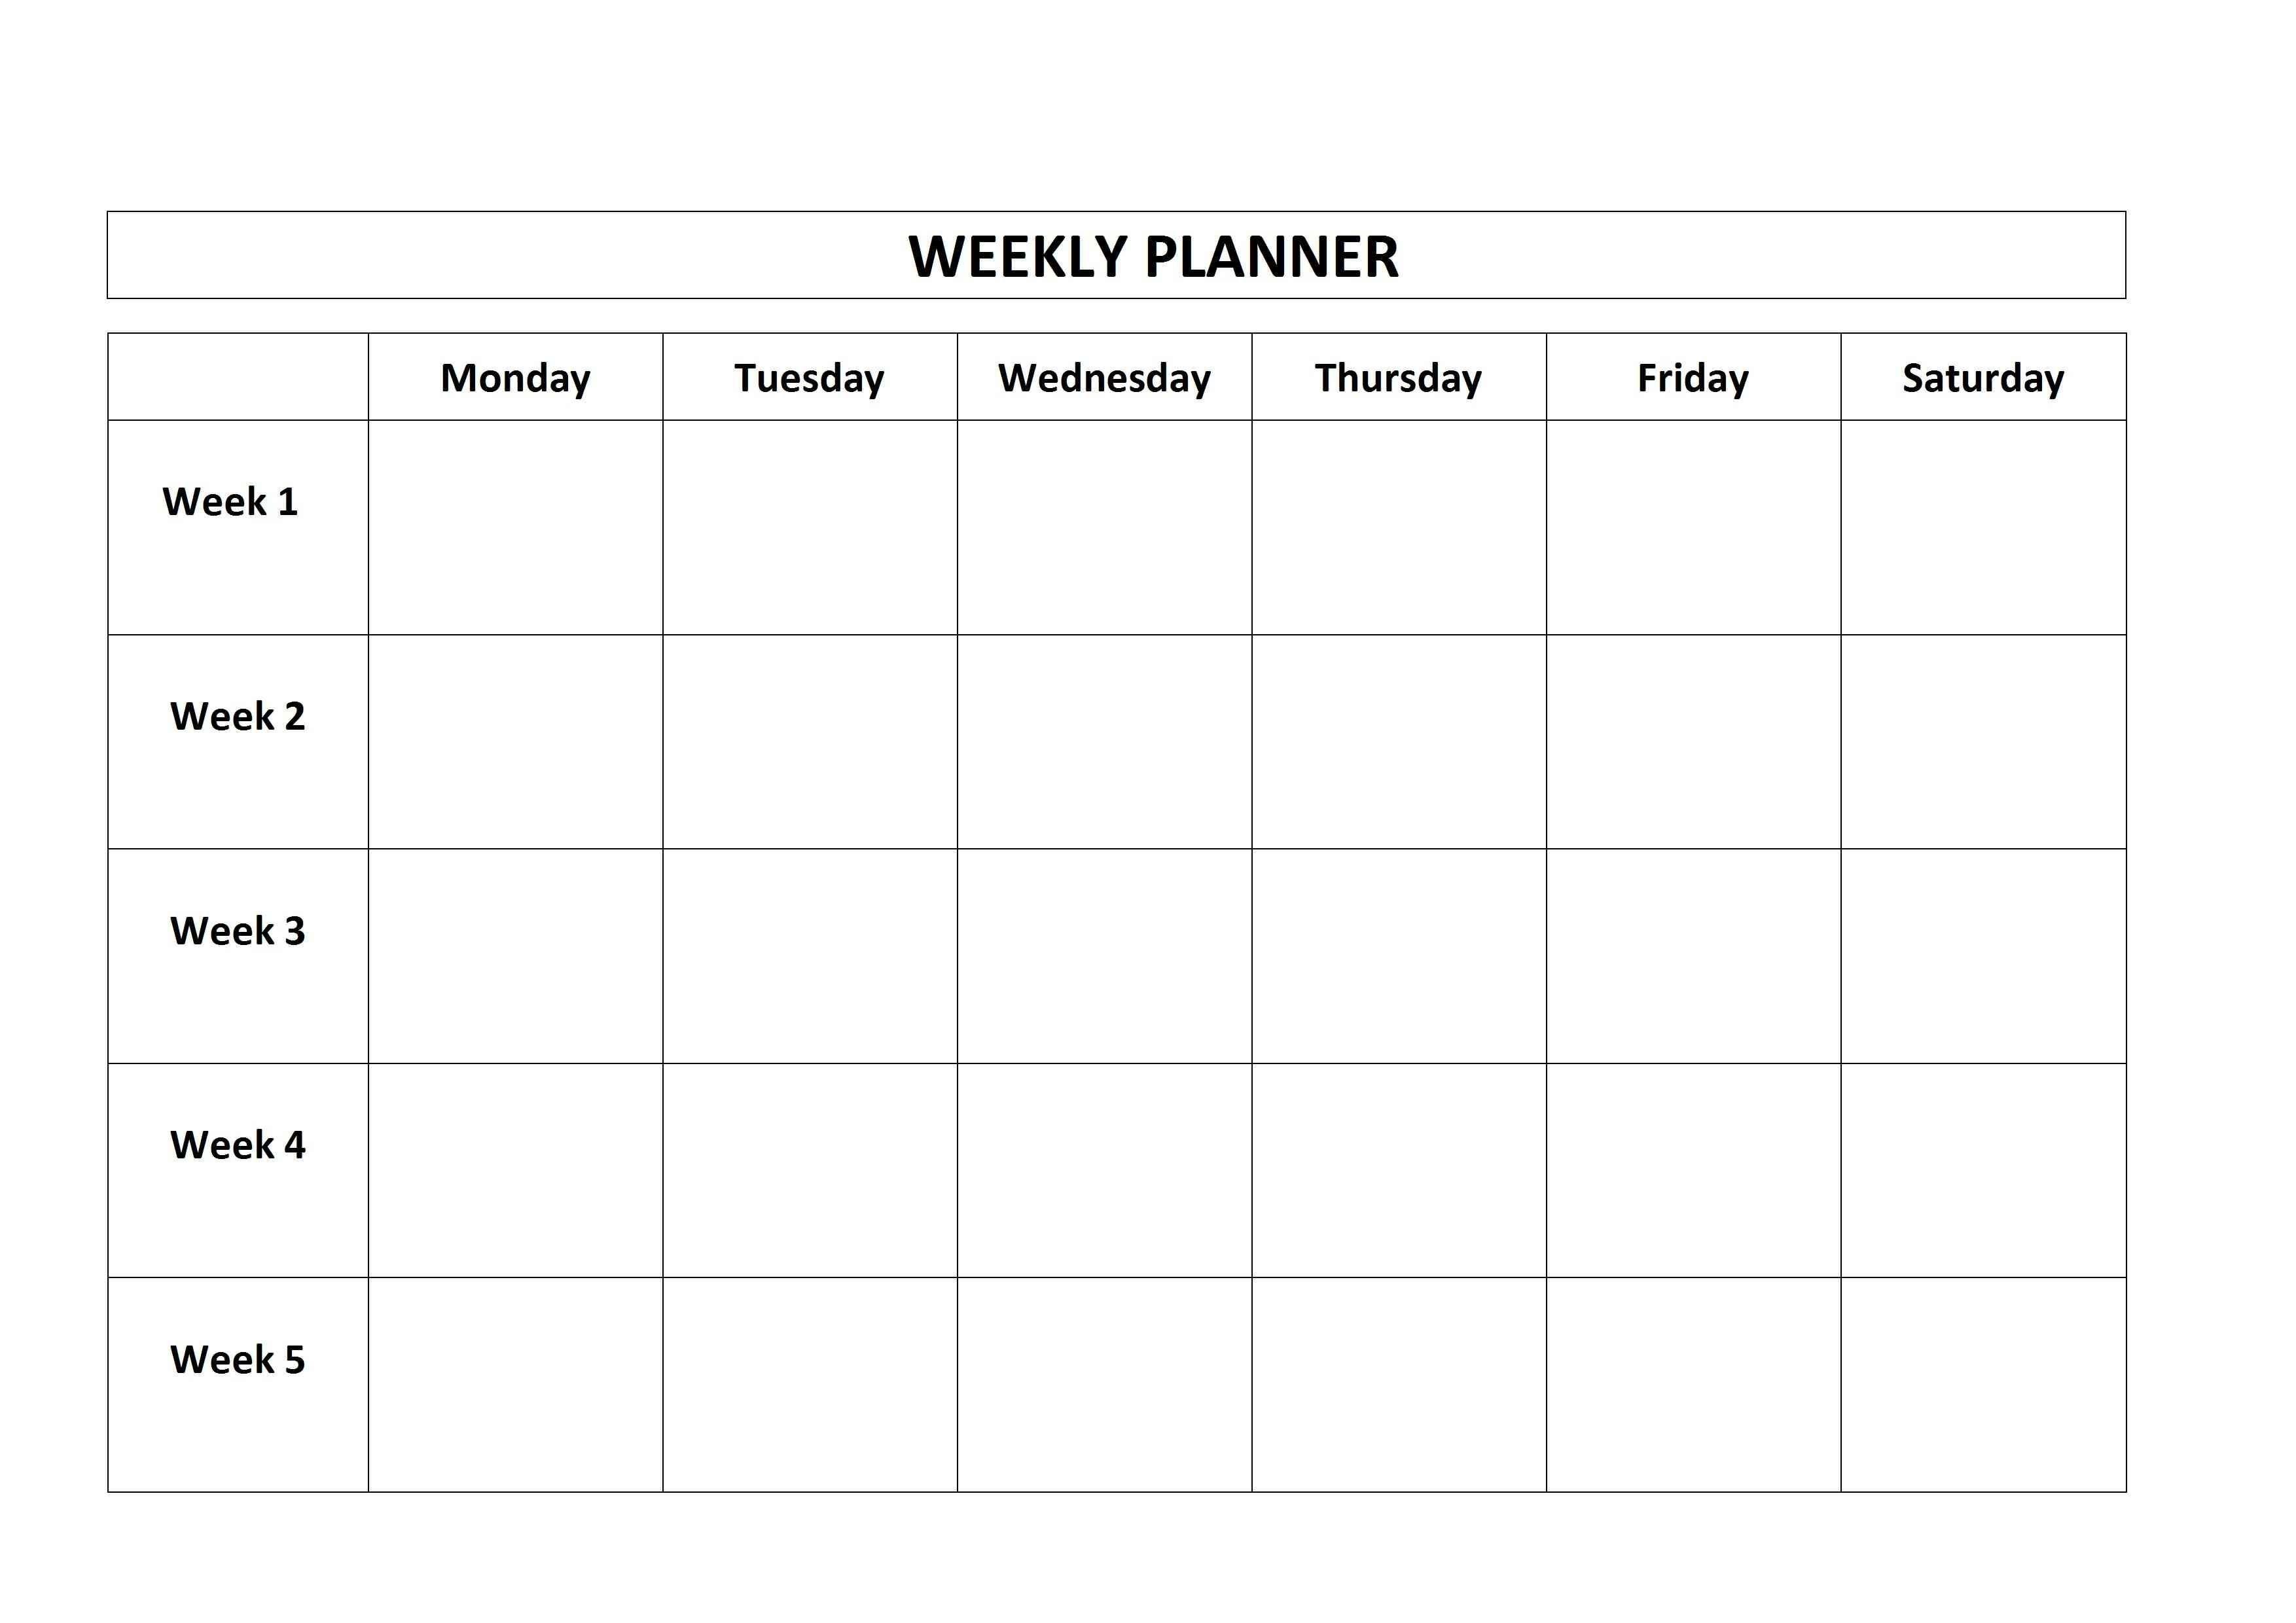 Free Printable Weekly Planner Monday Friday School Calendar-Monday To Friday 2 Week Calendar Template